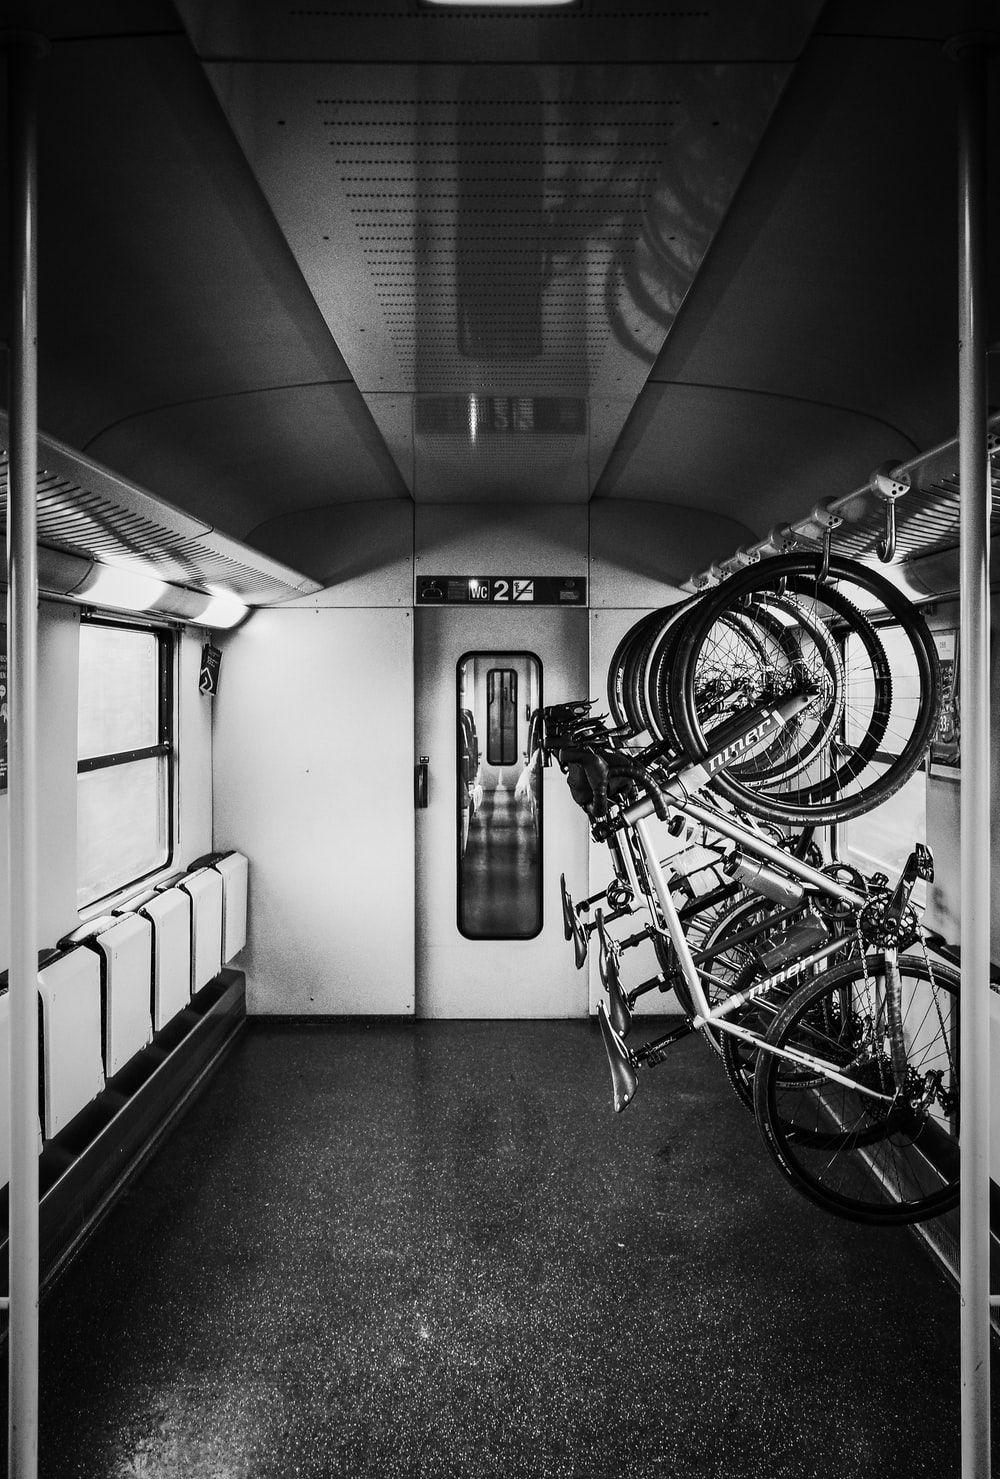 grayscale photo of bikes on rack